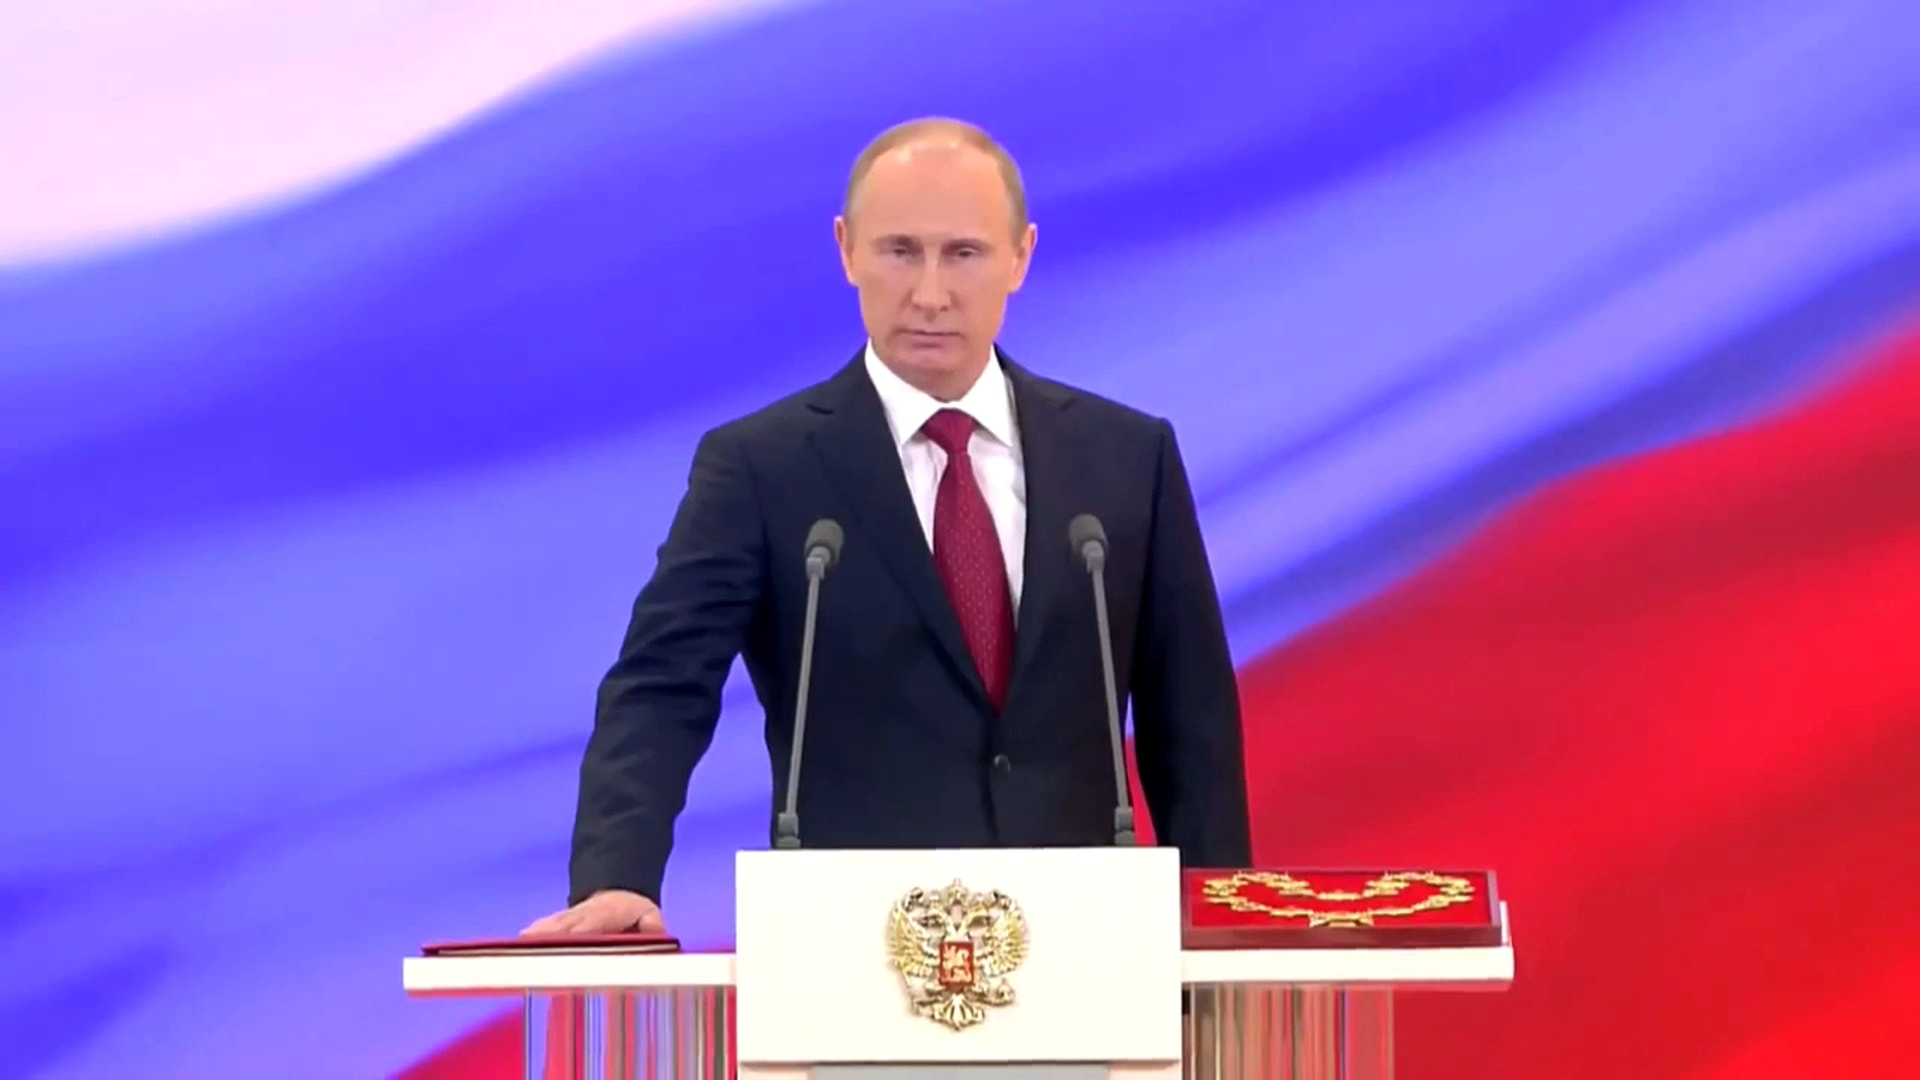 33 Vladimir Putin Wallpapers On Wallpapersafari